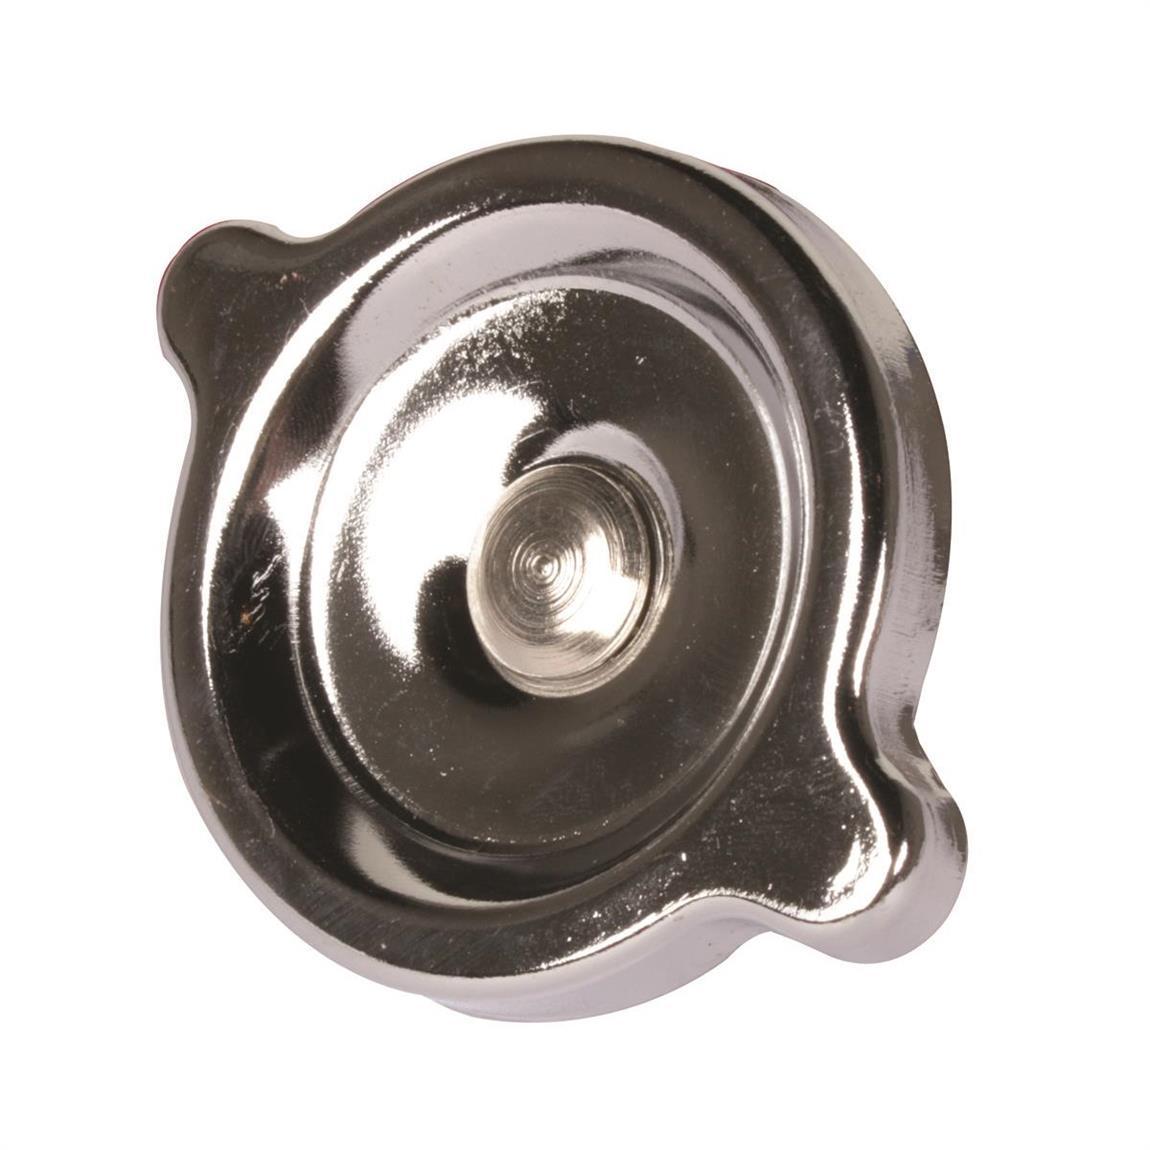 Twist In Spectre 43105 Chrome Oil Filler Cap